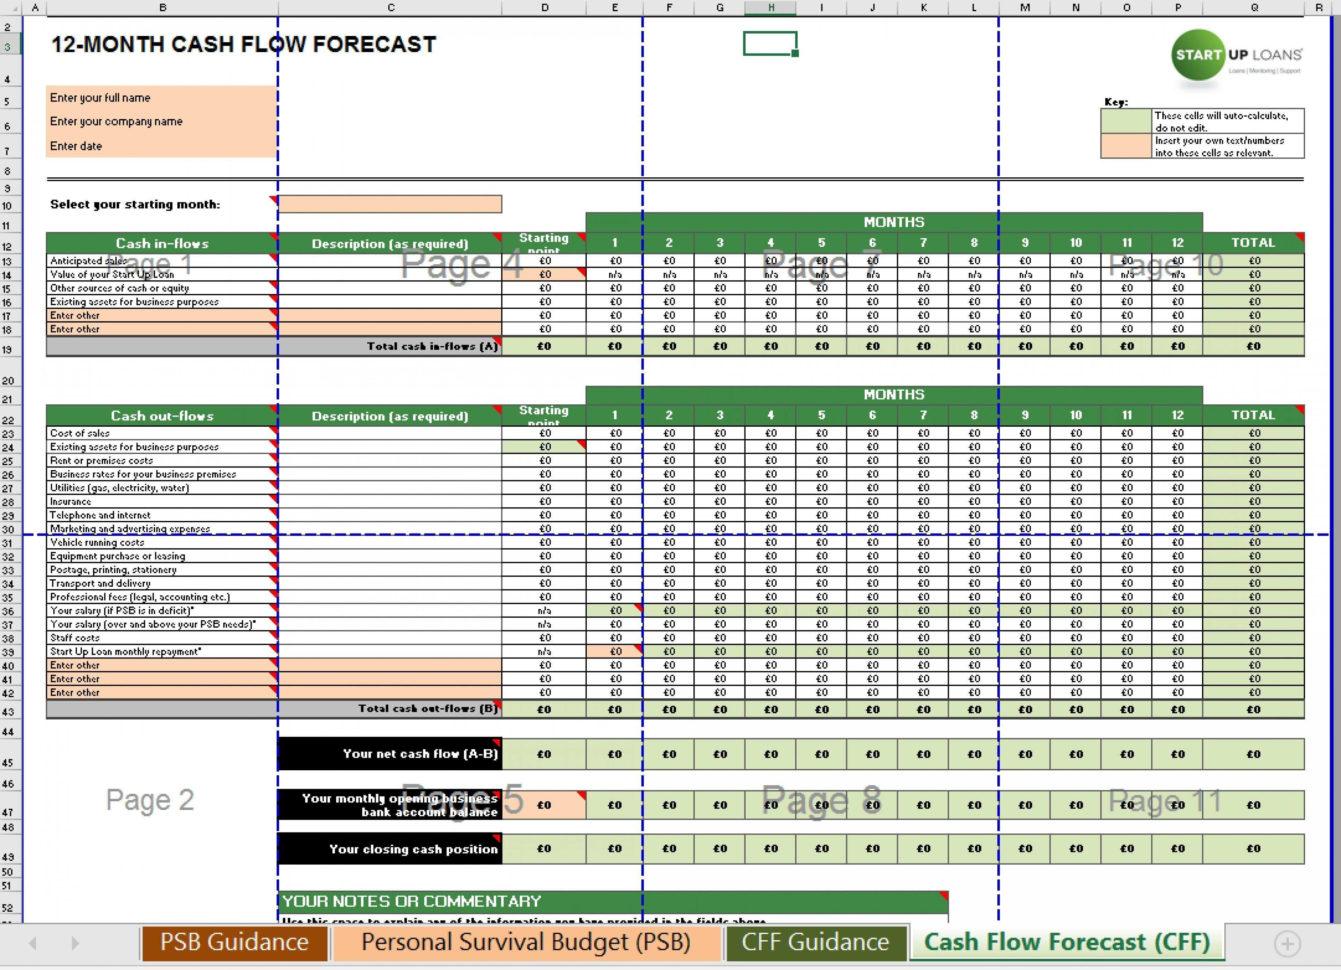 Daily Cash Flow Spreadsheet Google Spreadshee daily cash ...